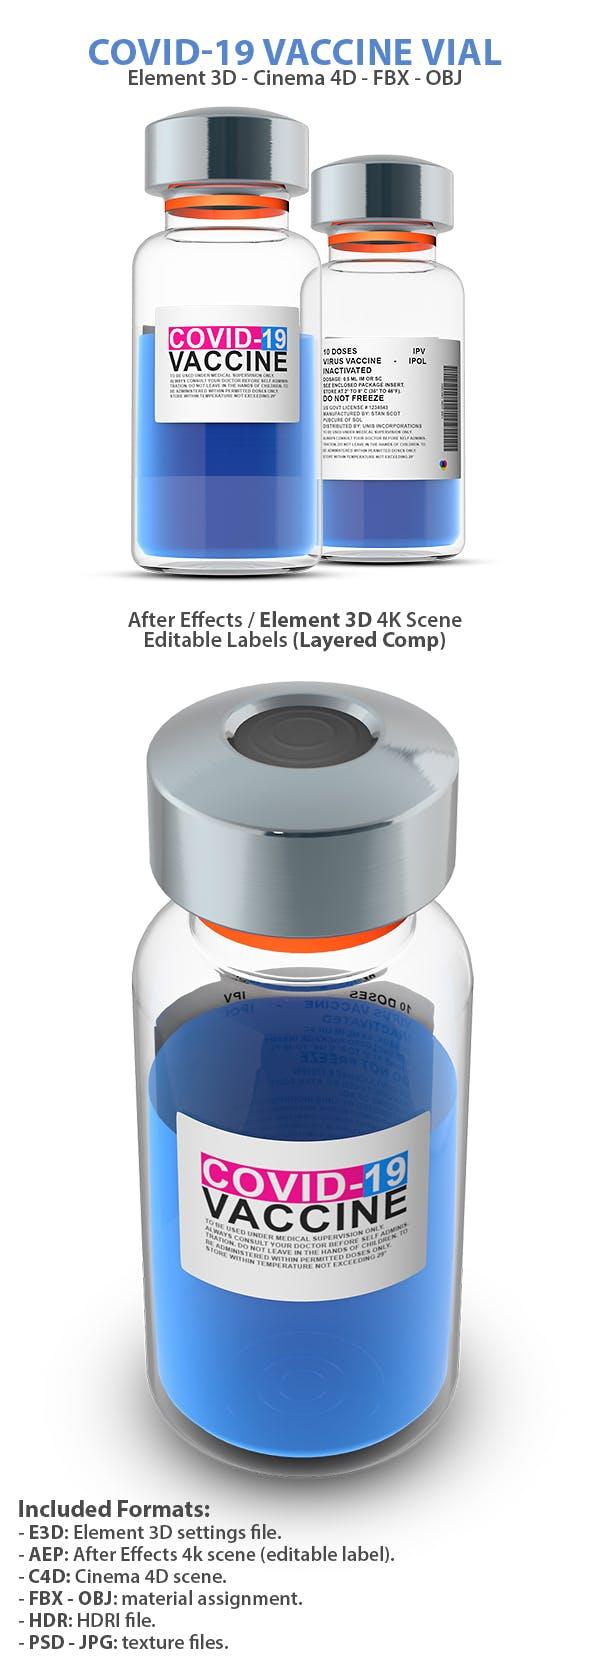 Vaccine Vial 3D Model for Element 3D & Cinema 4D - 3DOcean Item for Sale